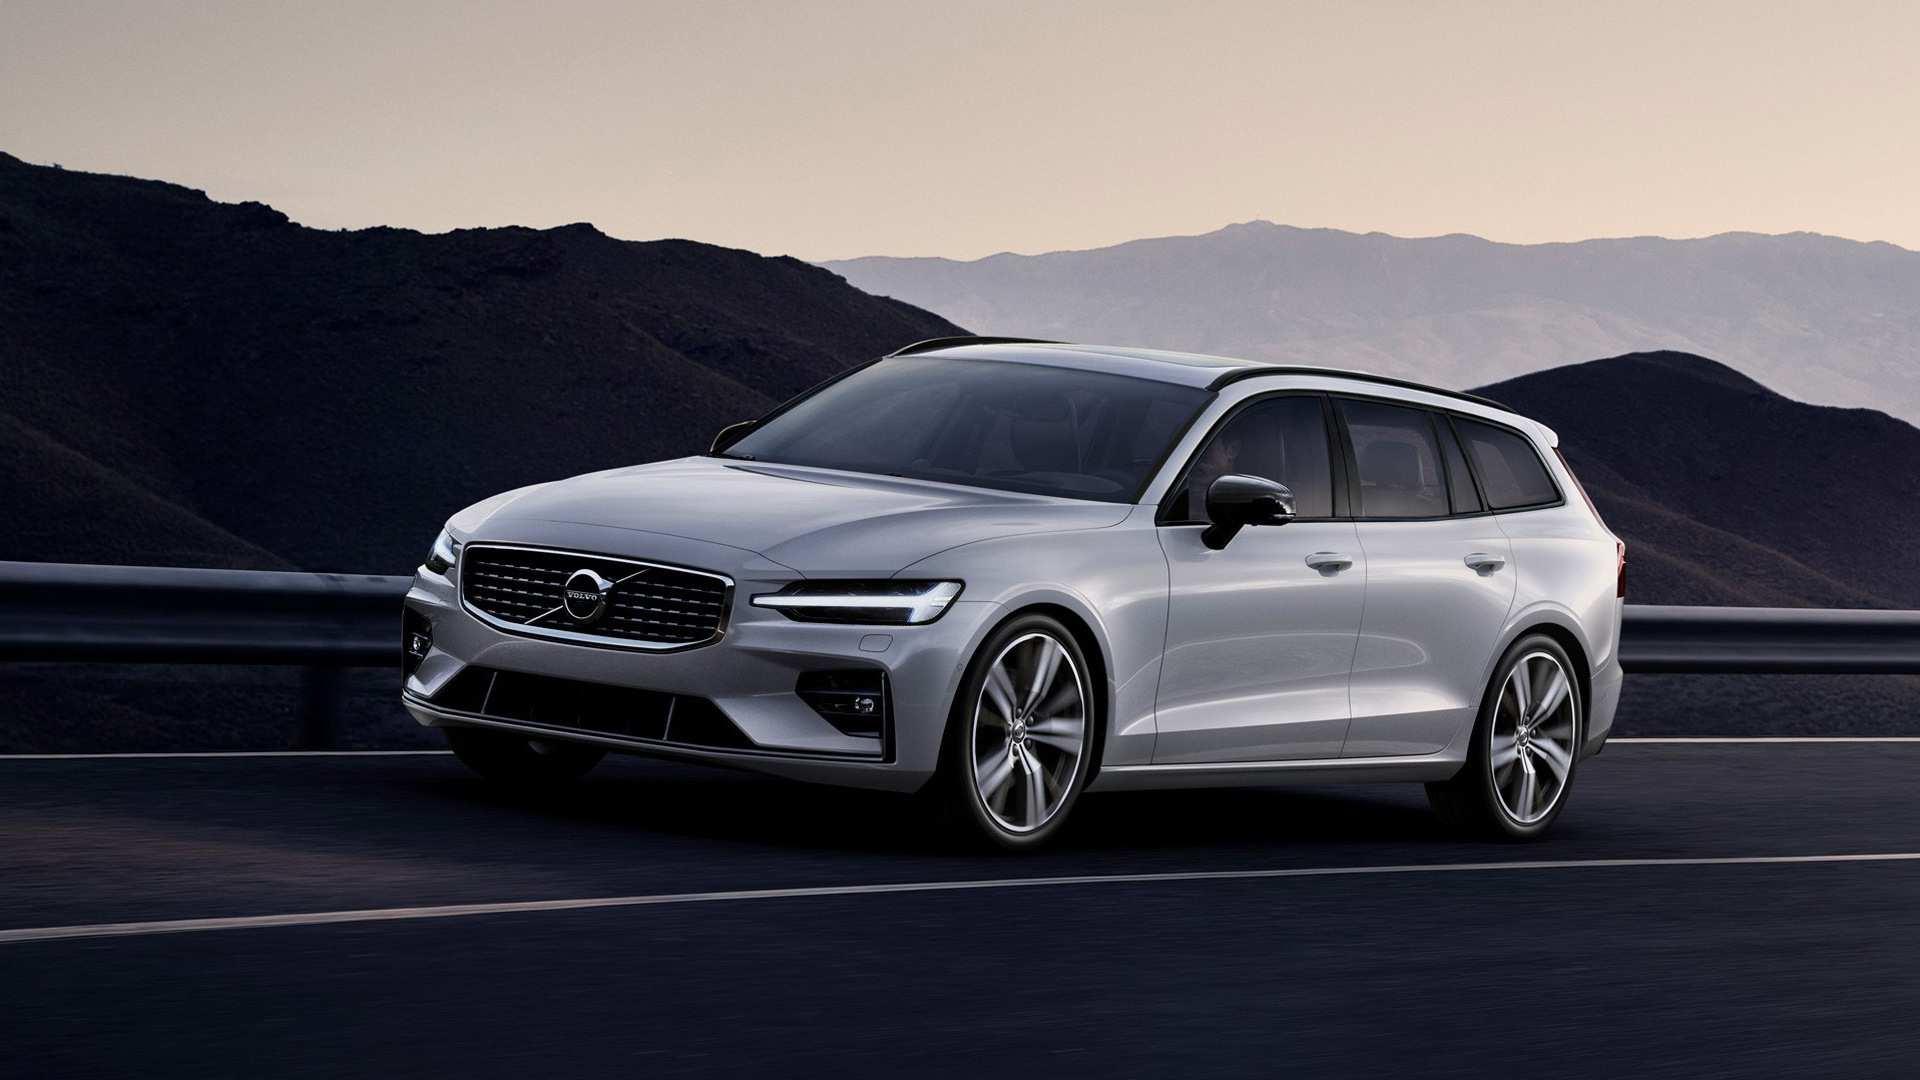 81 The Volvo 2019 V60 Review Interior Exterior And Review Engine with Volvo 2019 V60 Review Interior Exterior And Review